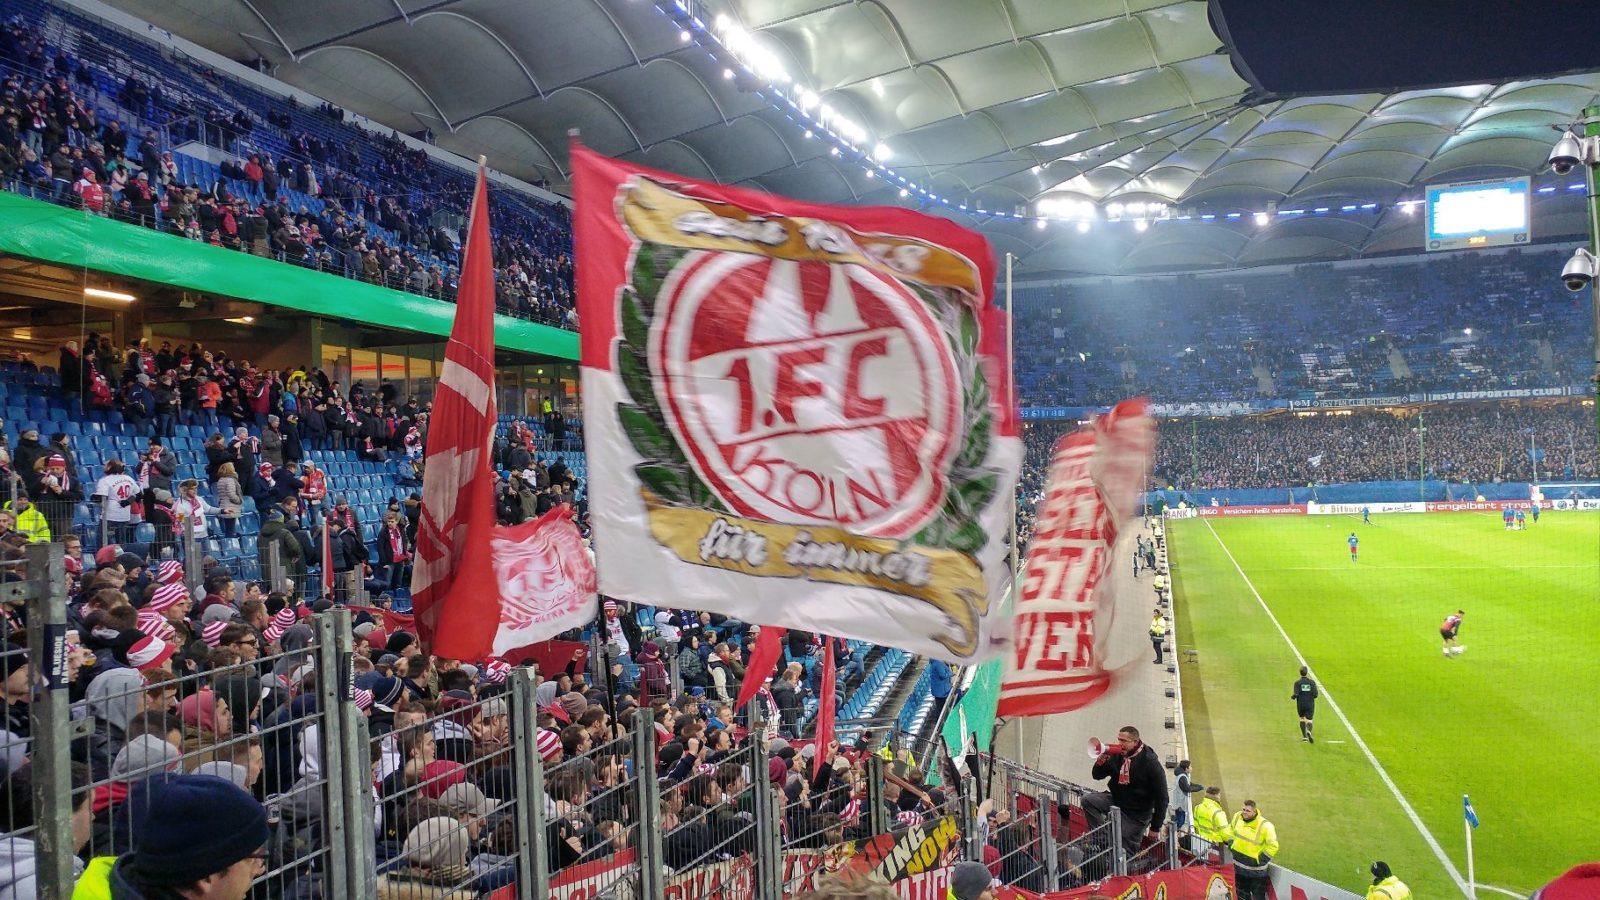 DFB Pokal HSV 1.FC Köln Foto von FC Fan Holger @Hanningkannix